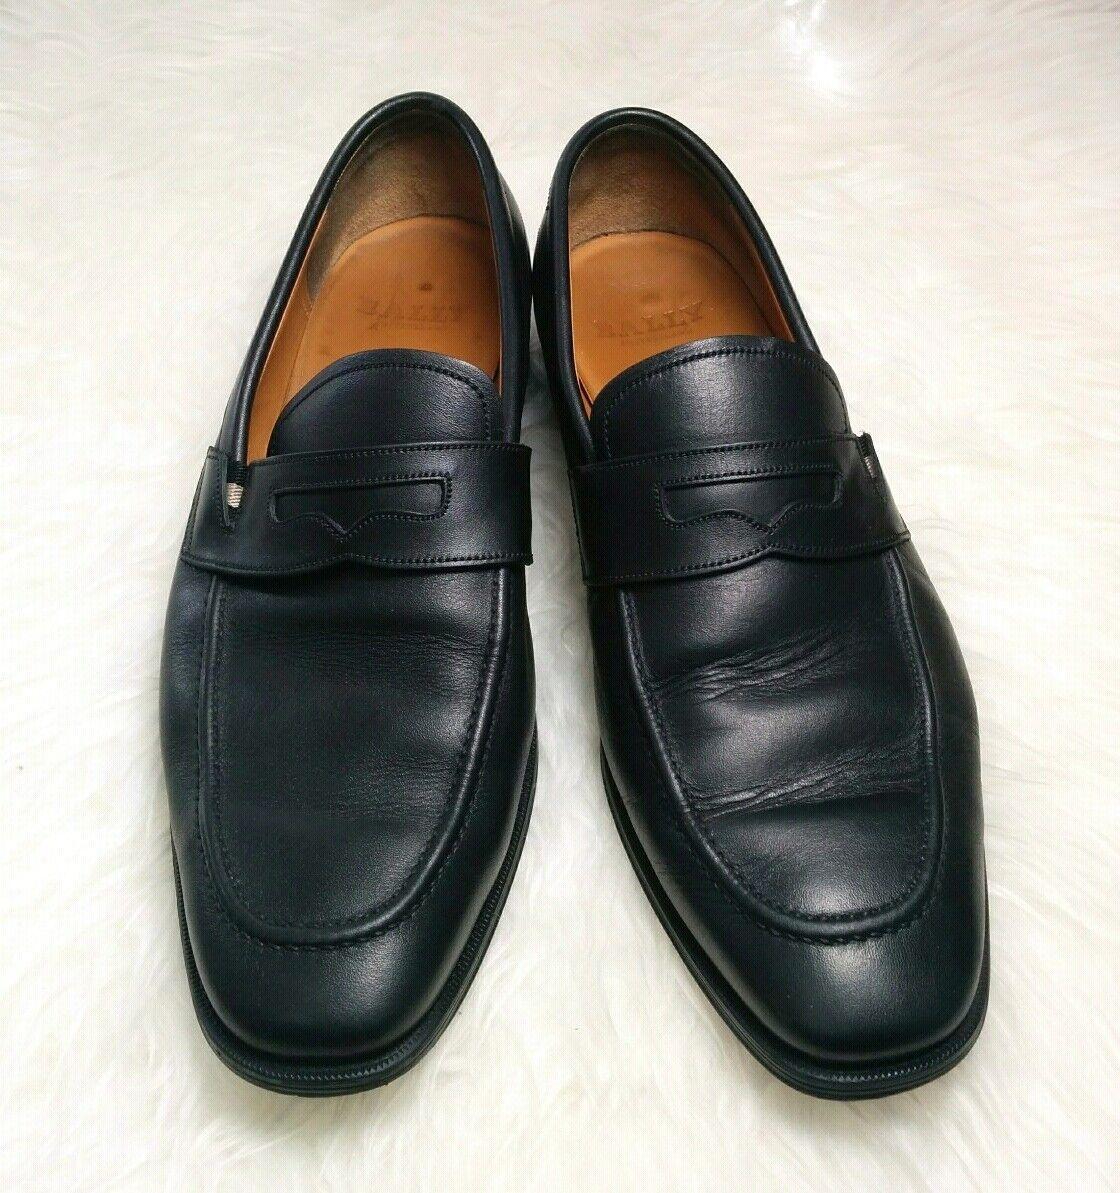 BALLY Todor Black Leather Loafers Slip On Apron Toe Men shoes US 10 D (EU 9E)